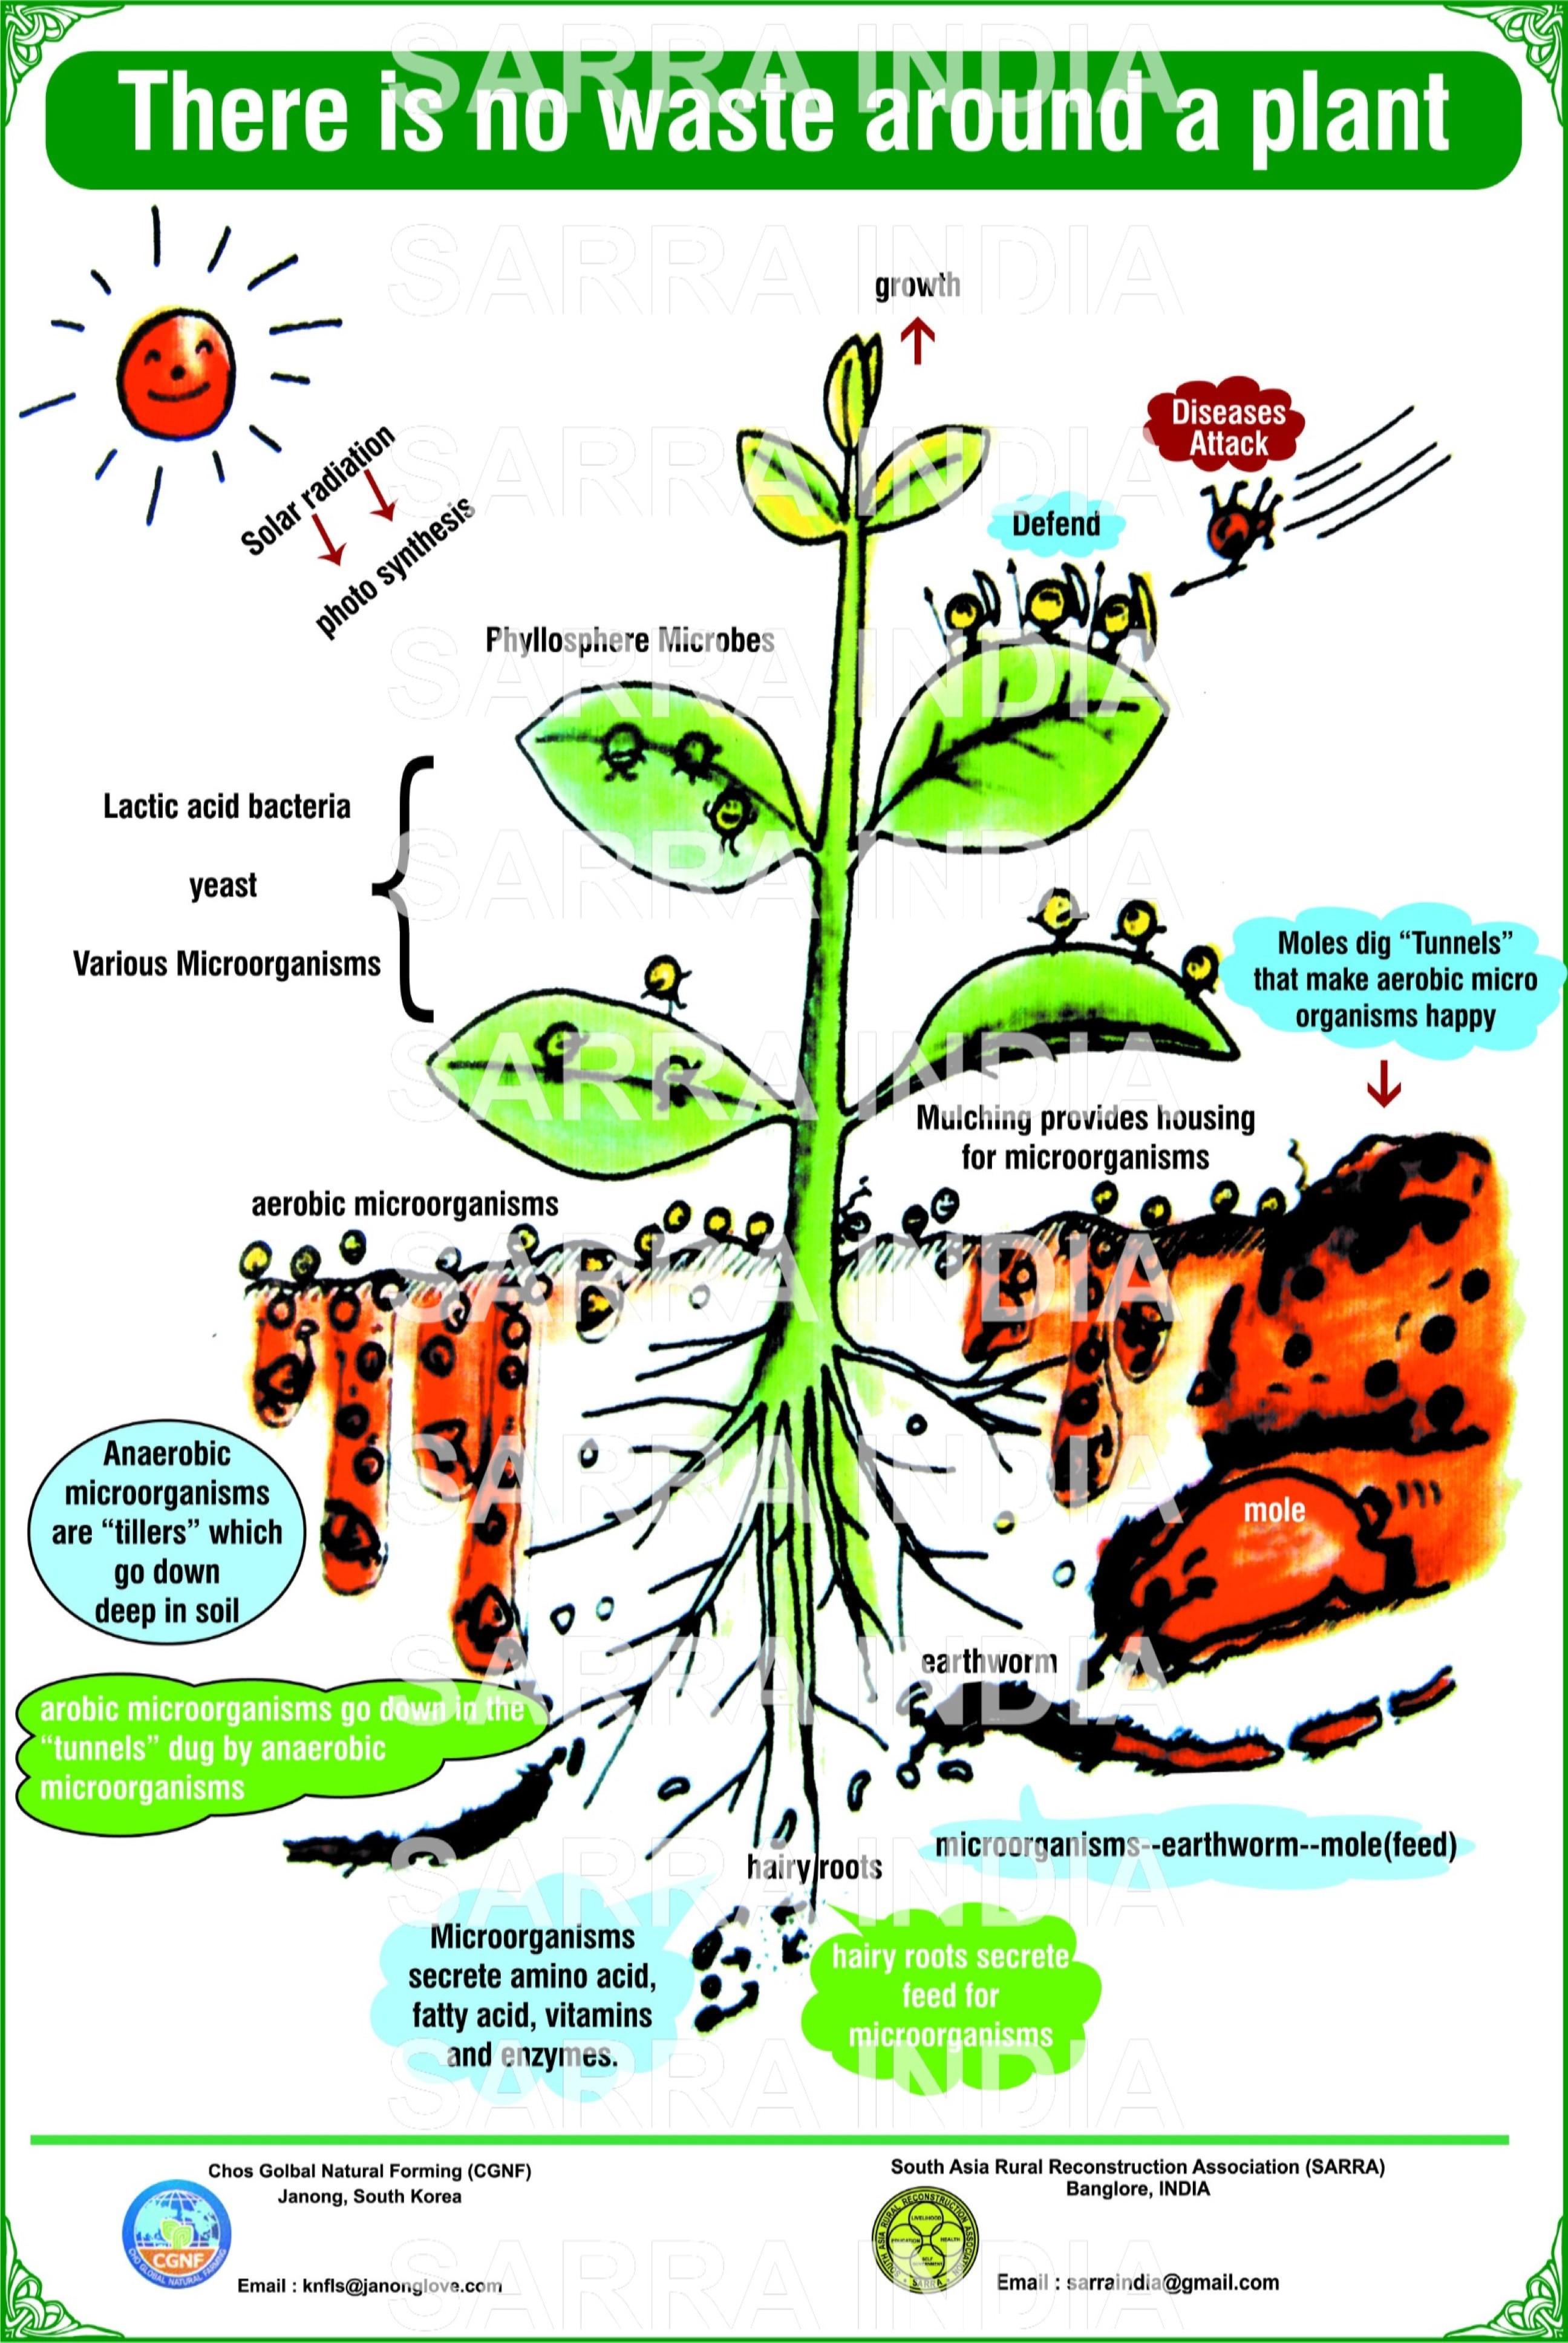 Cho S Global Natural Farming